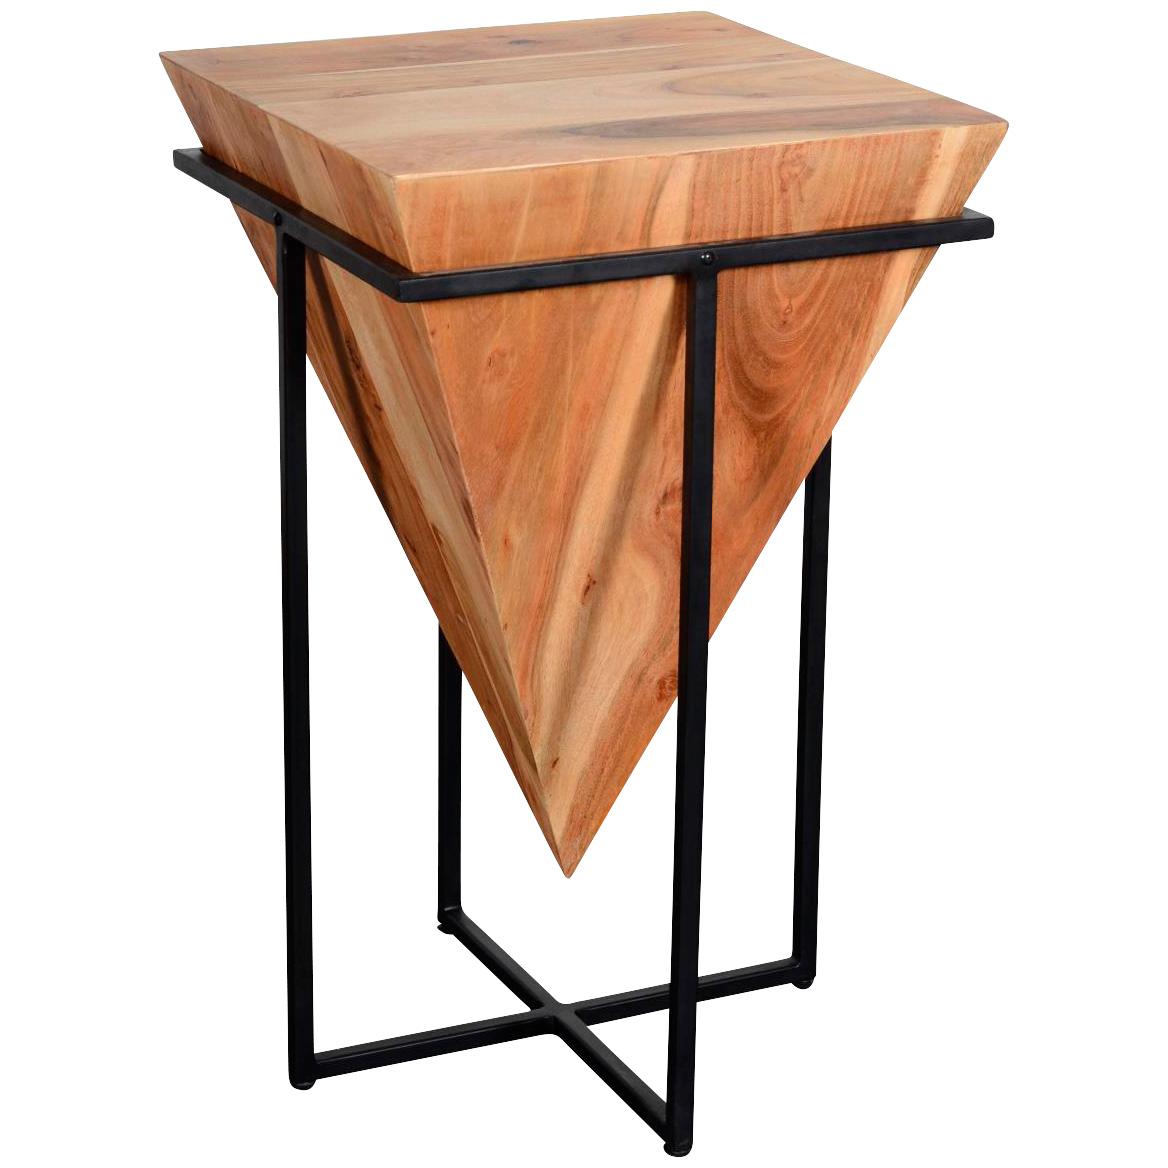 Design Destinations | Brixton Natural Small End Table